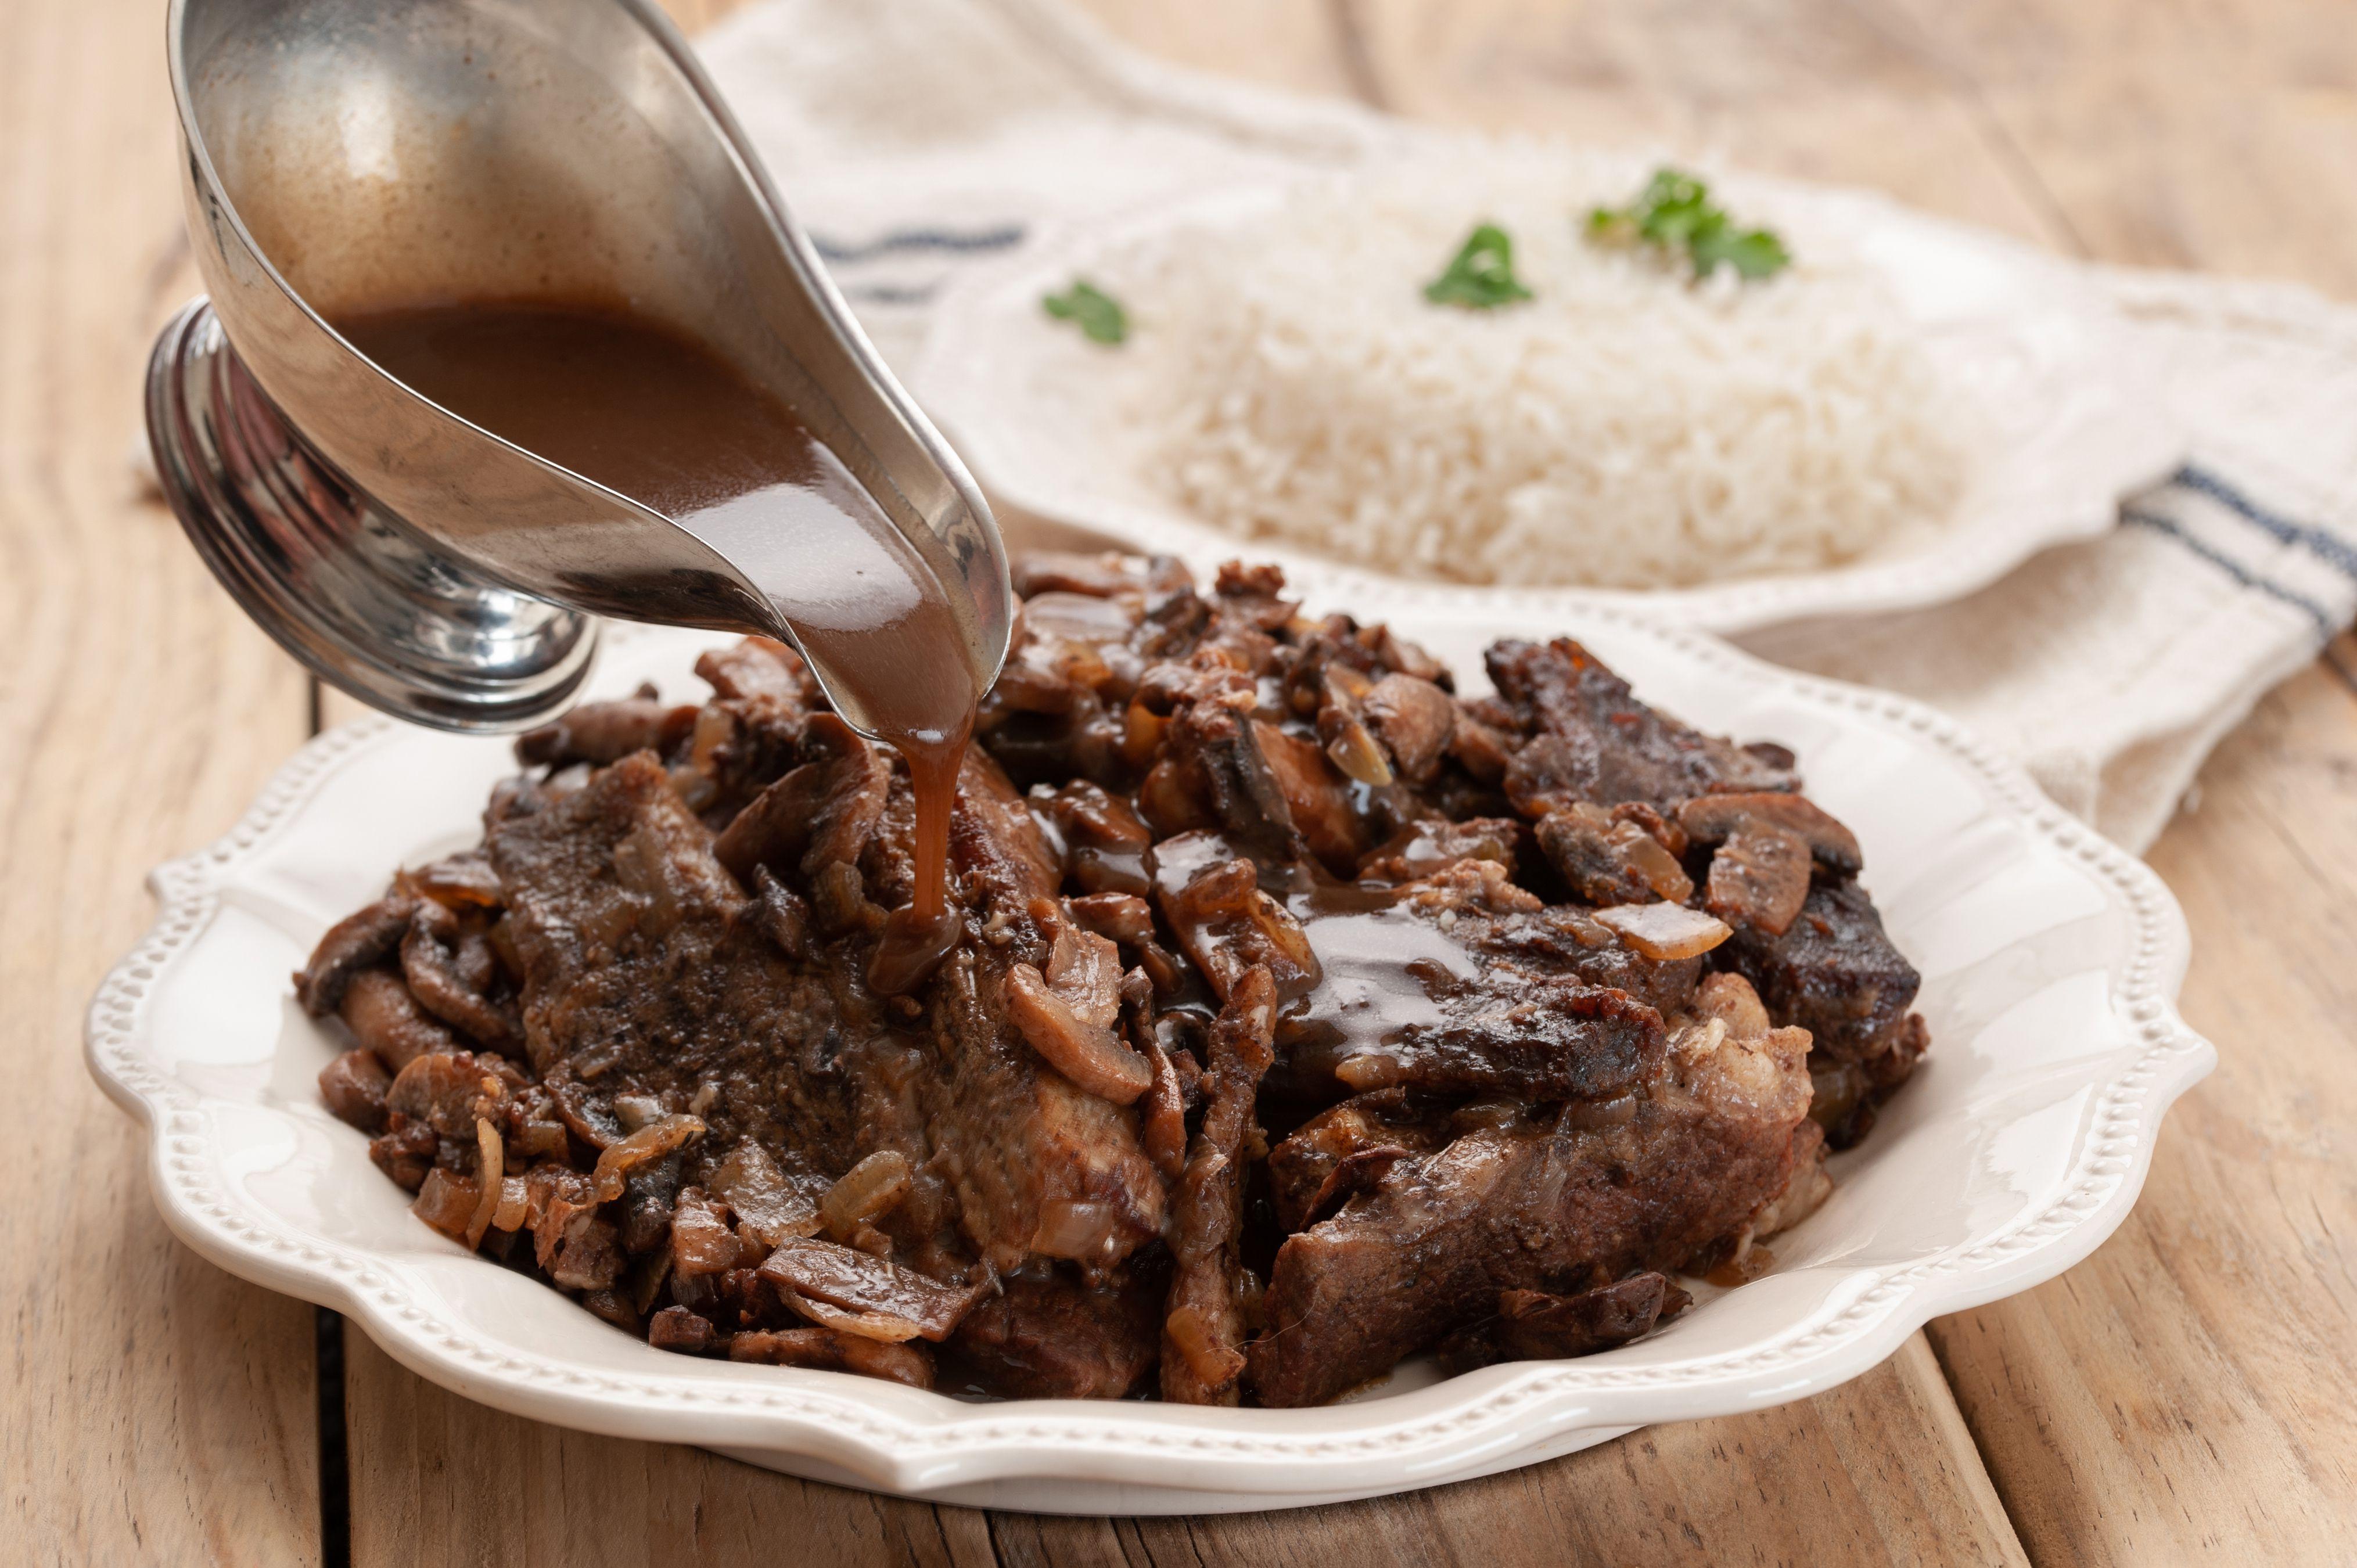 Serve short ribs with gravy